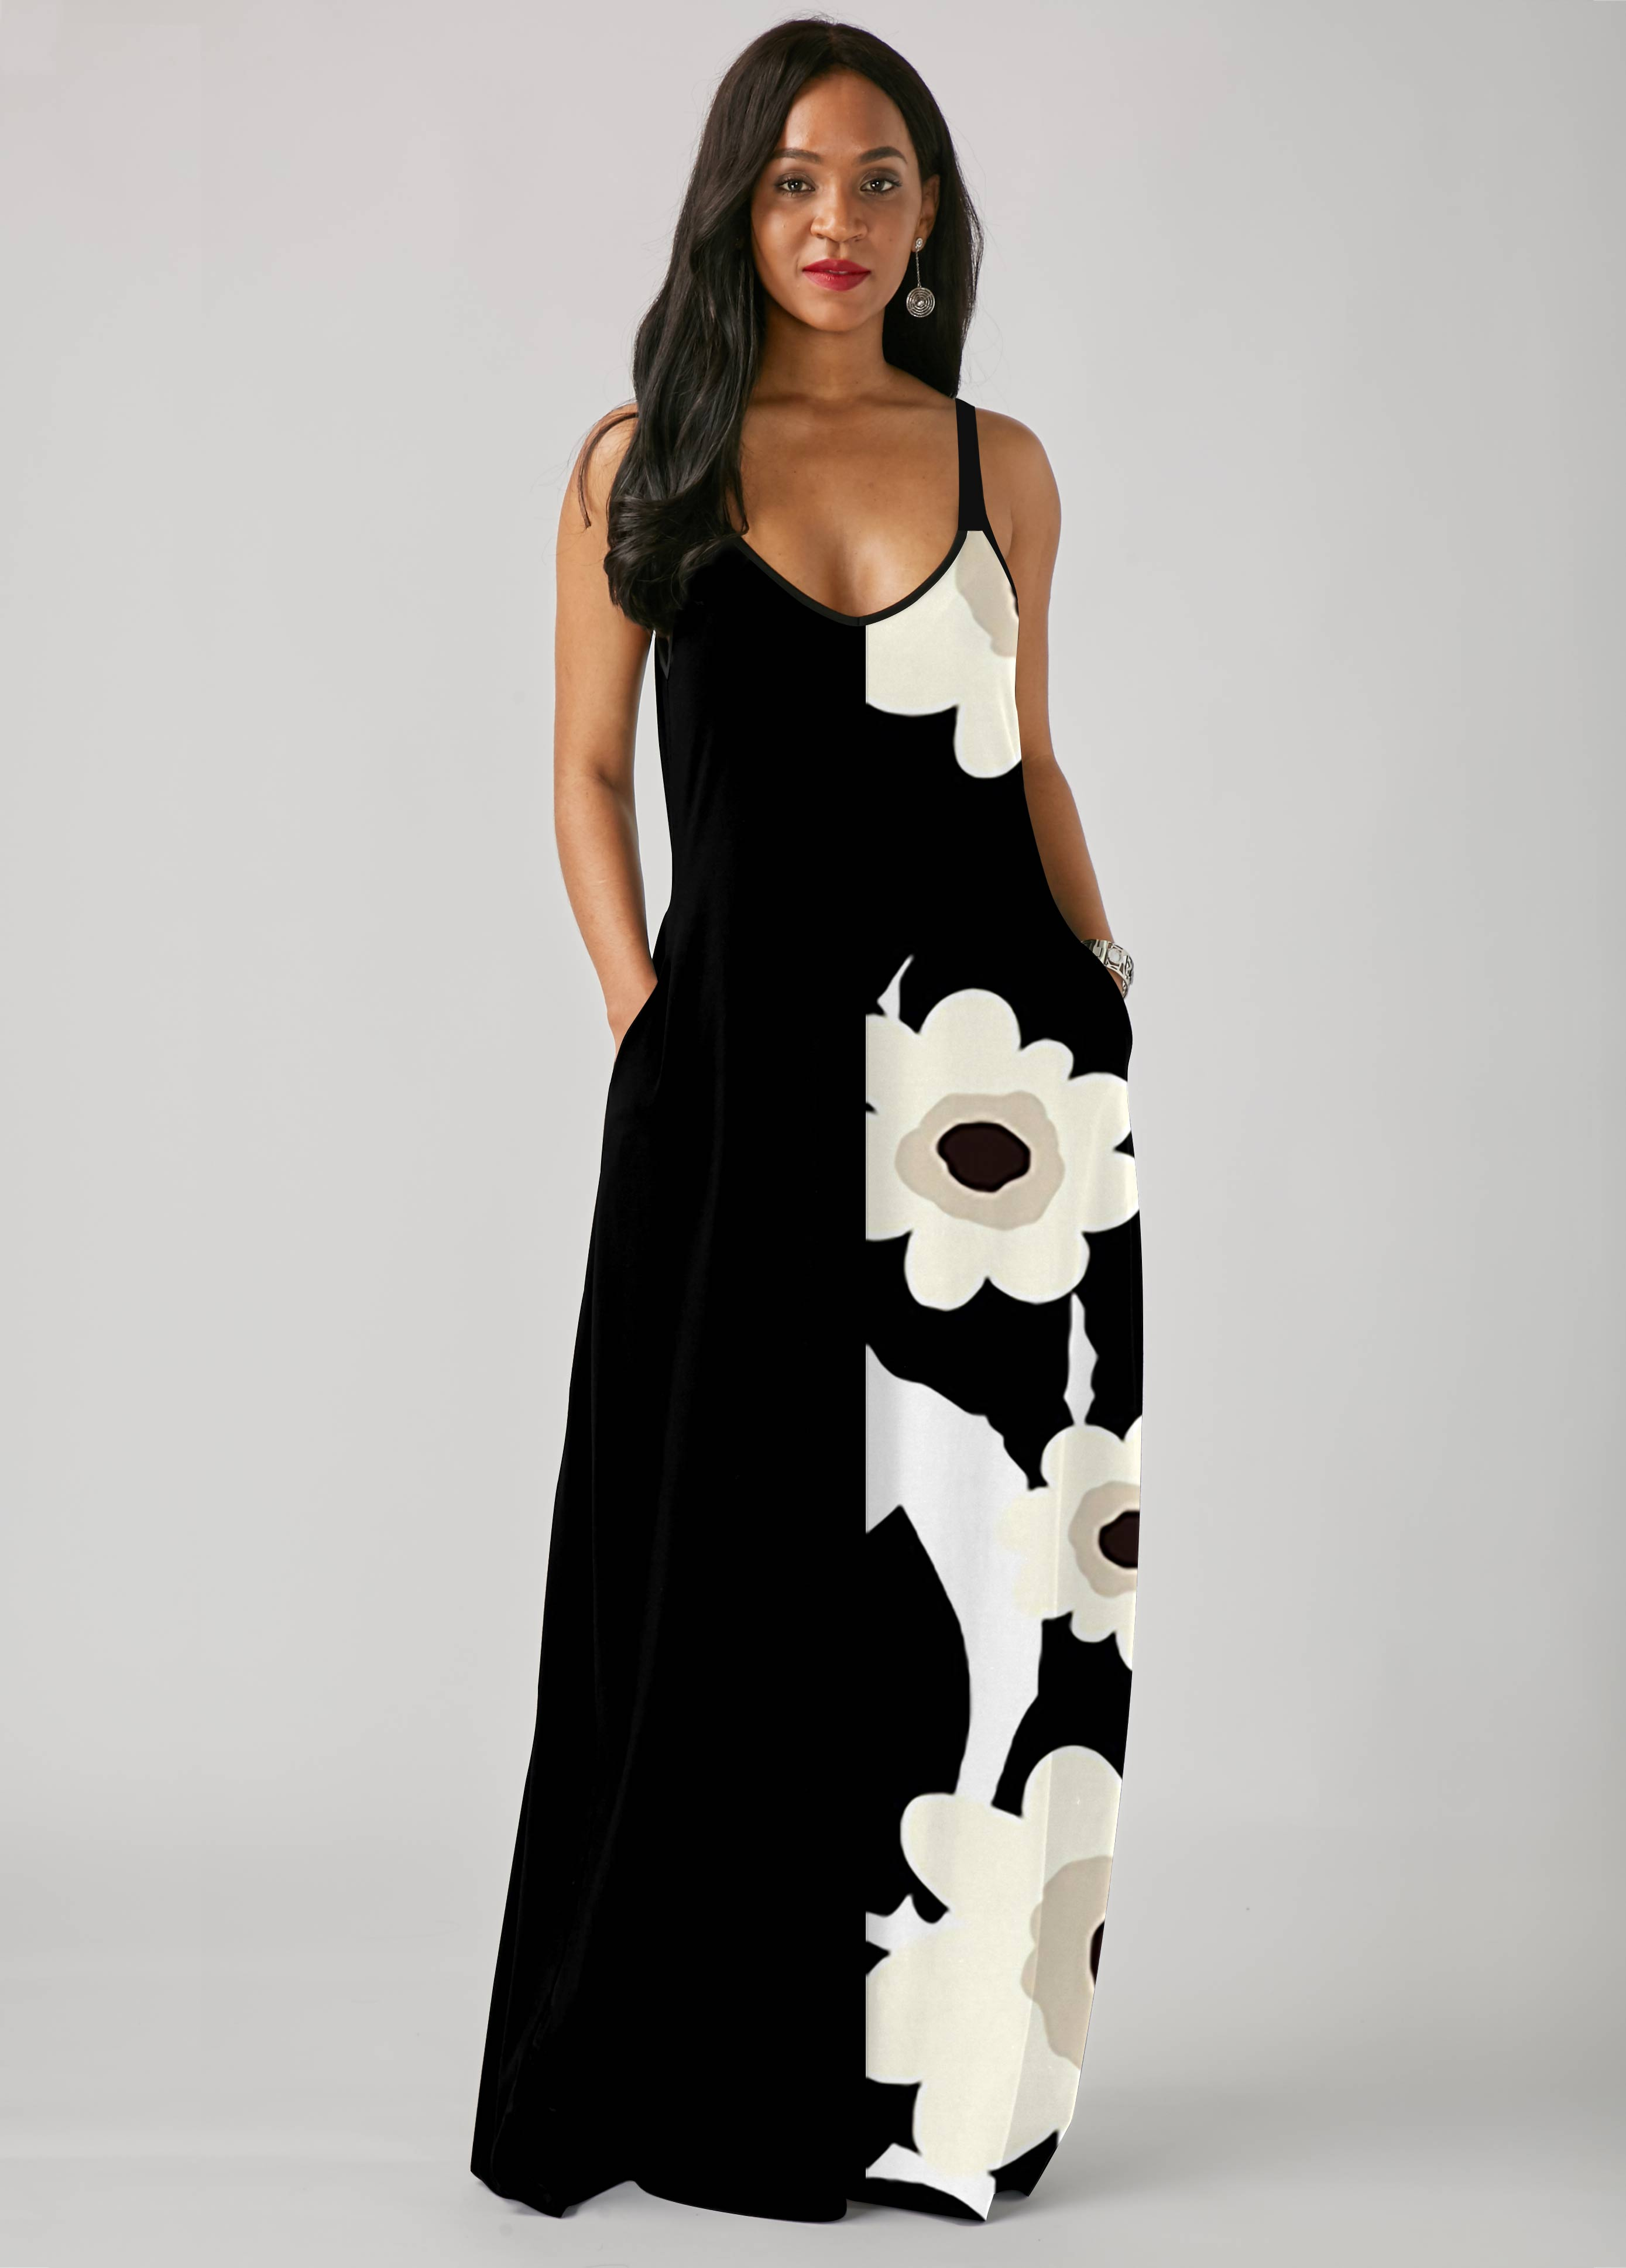 Pocket Floral Print Spaghetti Strap Dress